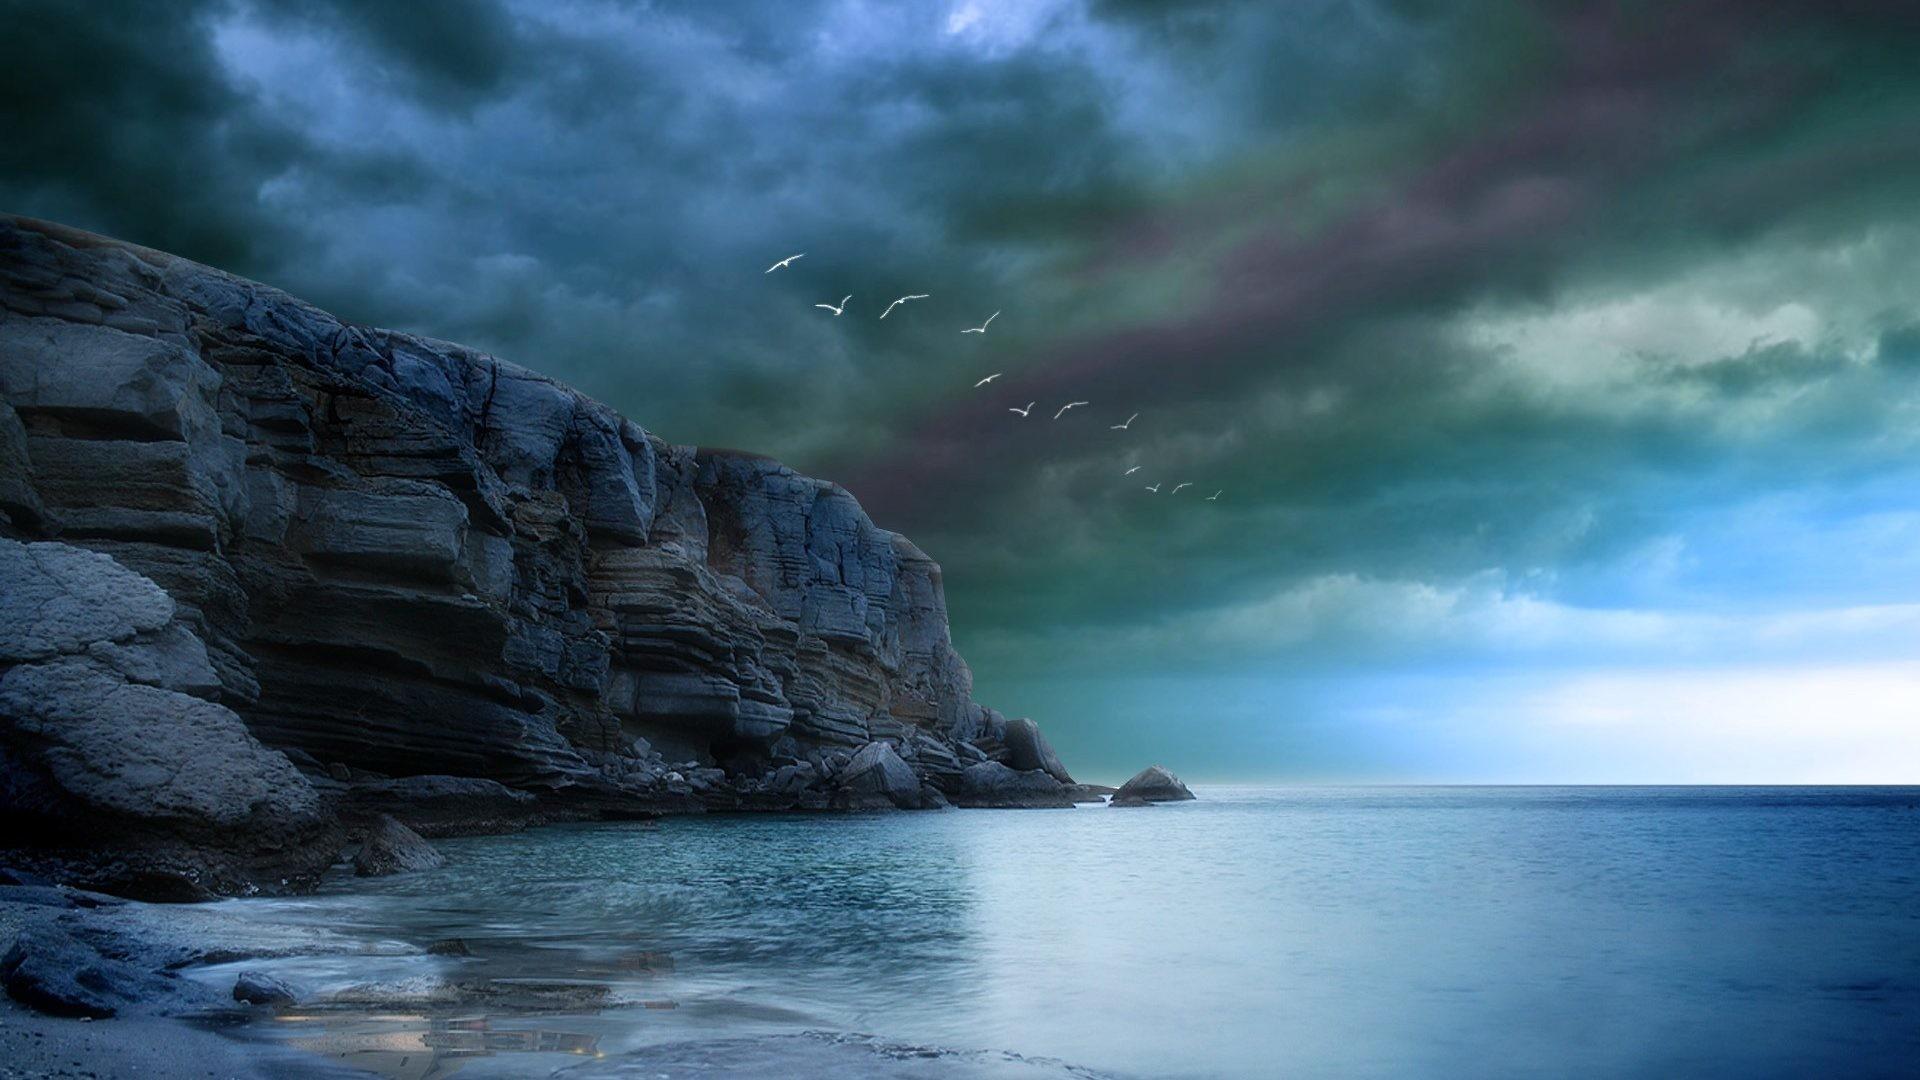 Oceans – Rocky Amazing Rock Blue Birds Sky Sea Clouds Dark Ocean Storm  Storms Cliff Beautiful